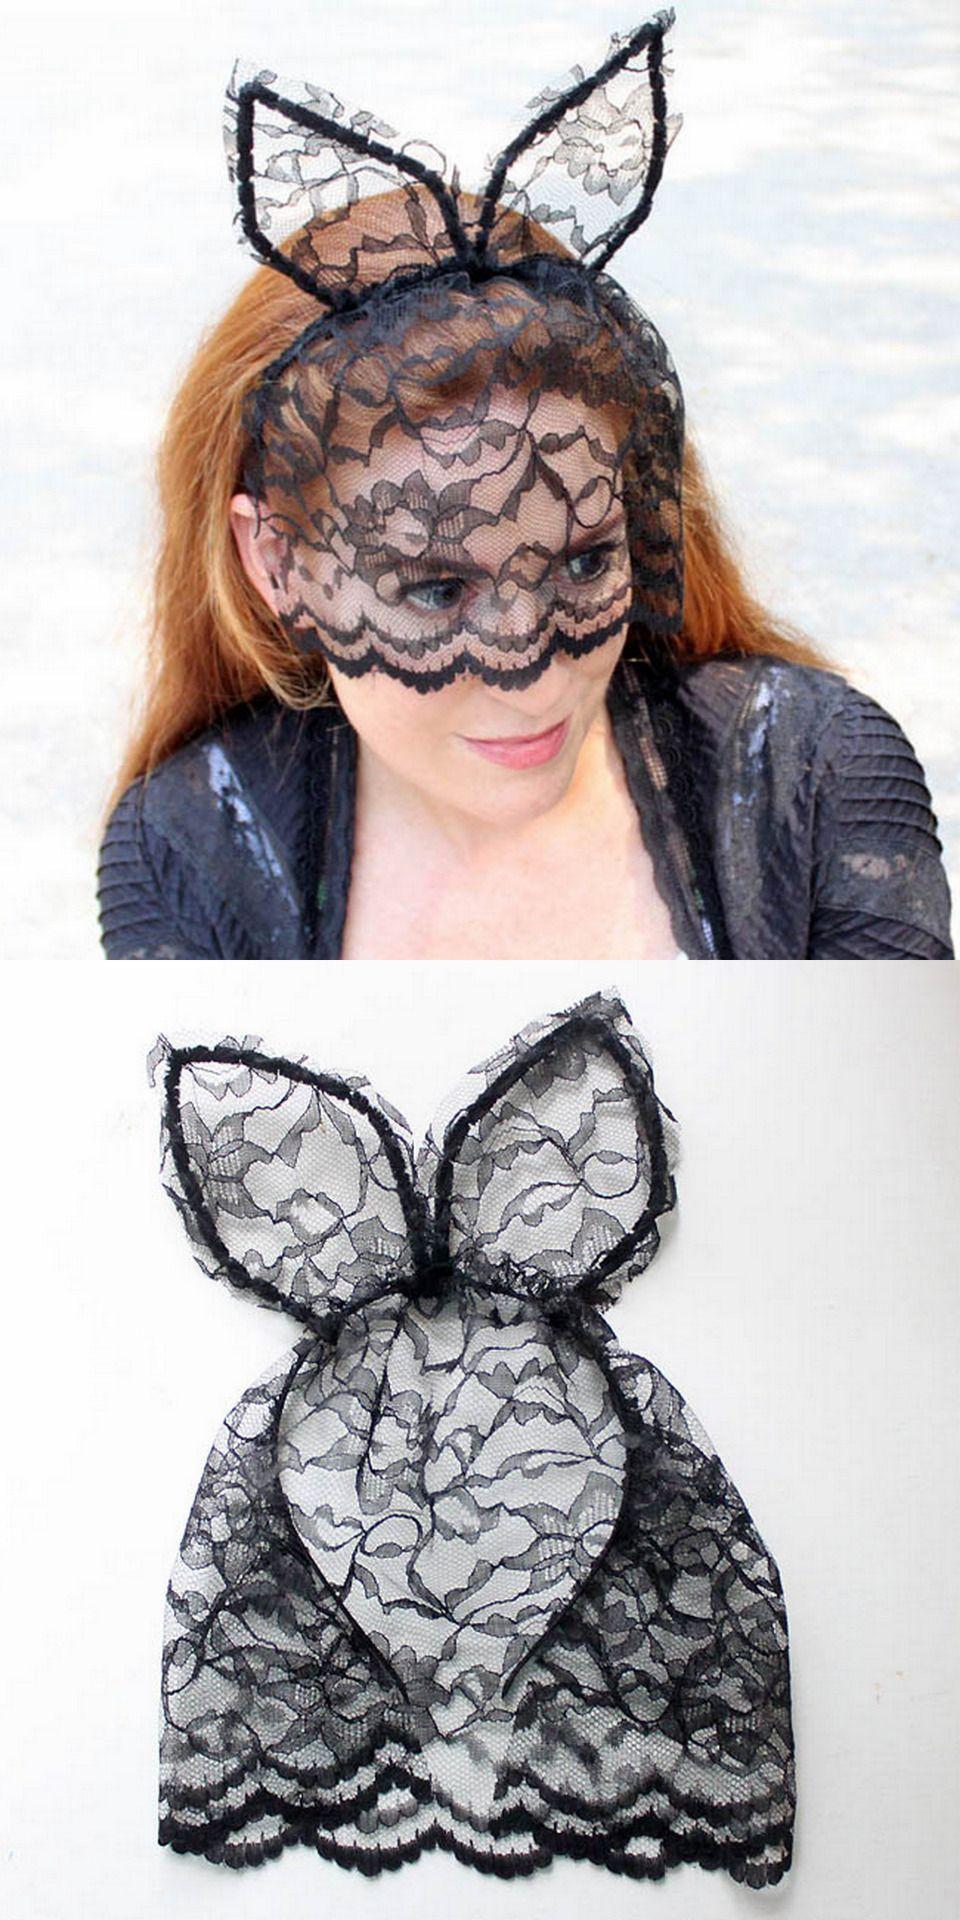 diy veiled cat ear headband tutorial from gina michele. this diy